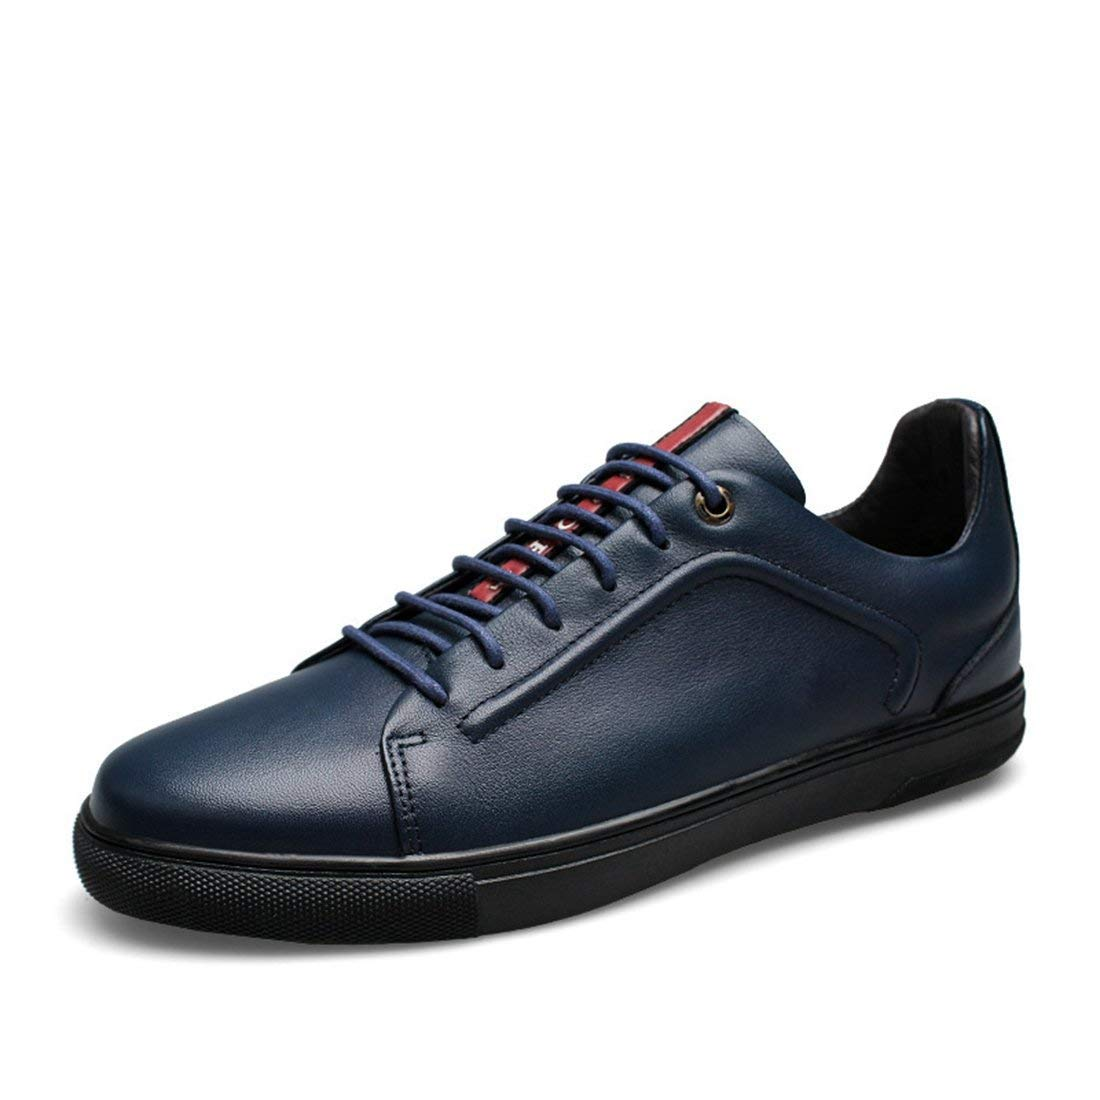 Dark bluee Qiusa Boy's Men's Tuber Comfortable Designer Sport Fashon Sneakers (color   Dark bluee, Size   5 UK)